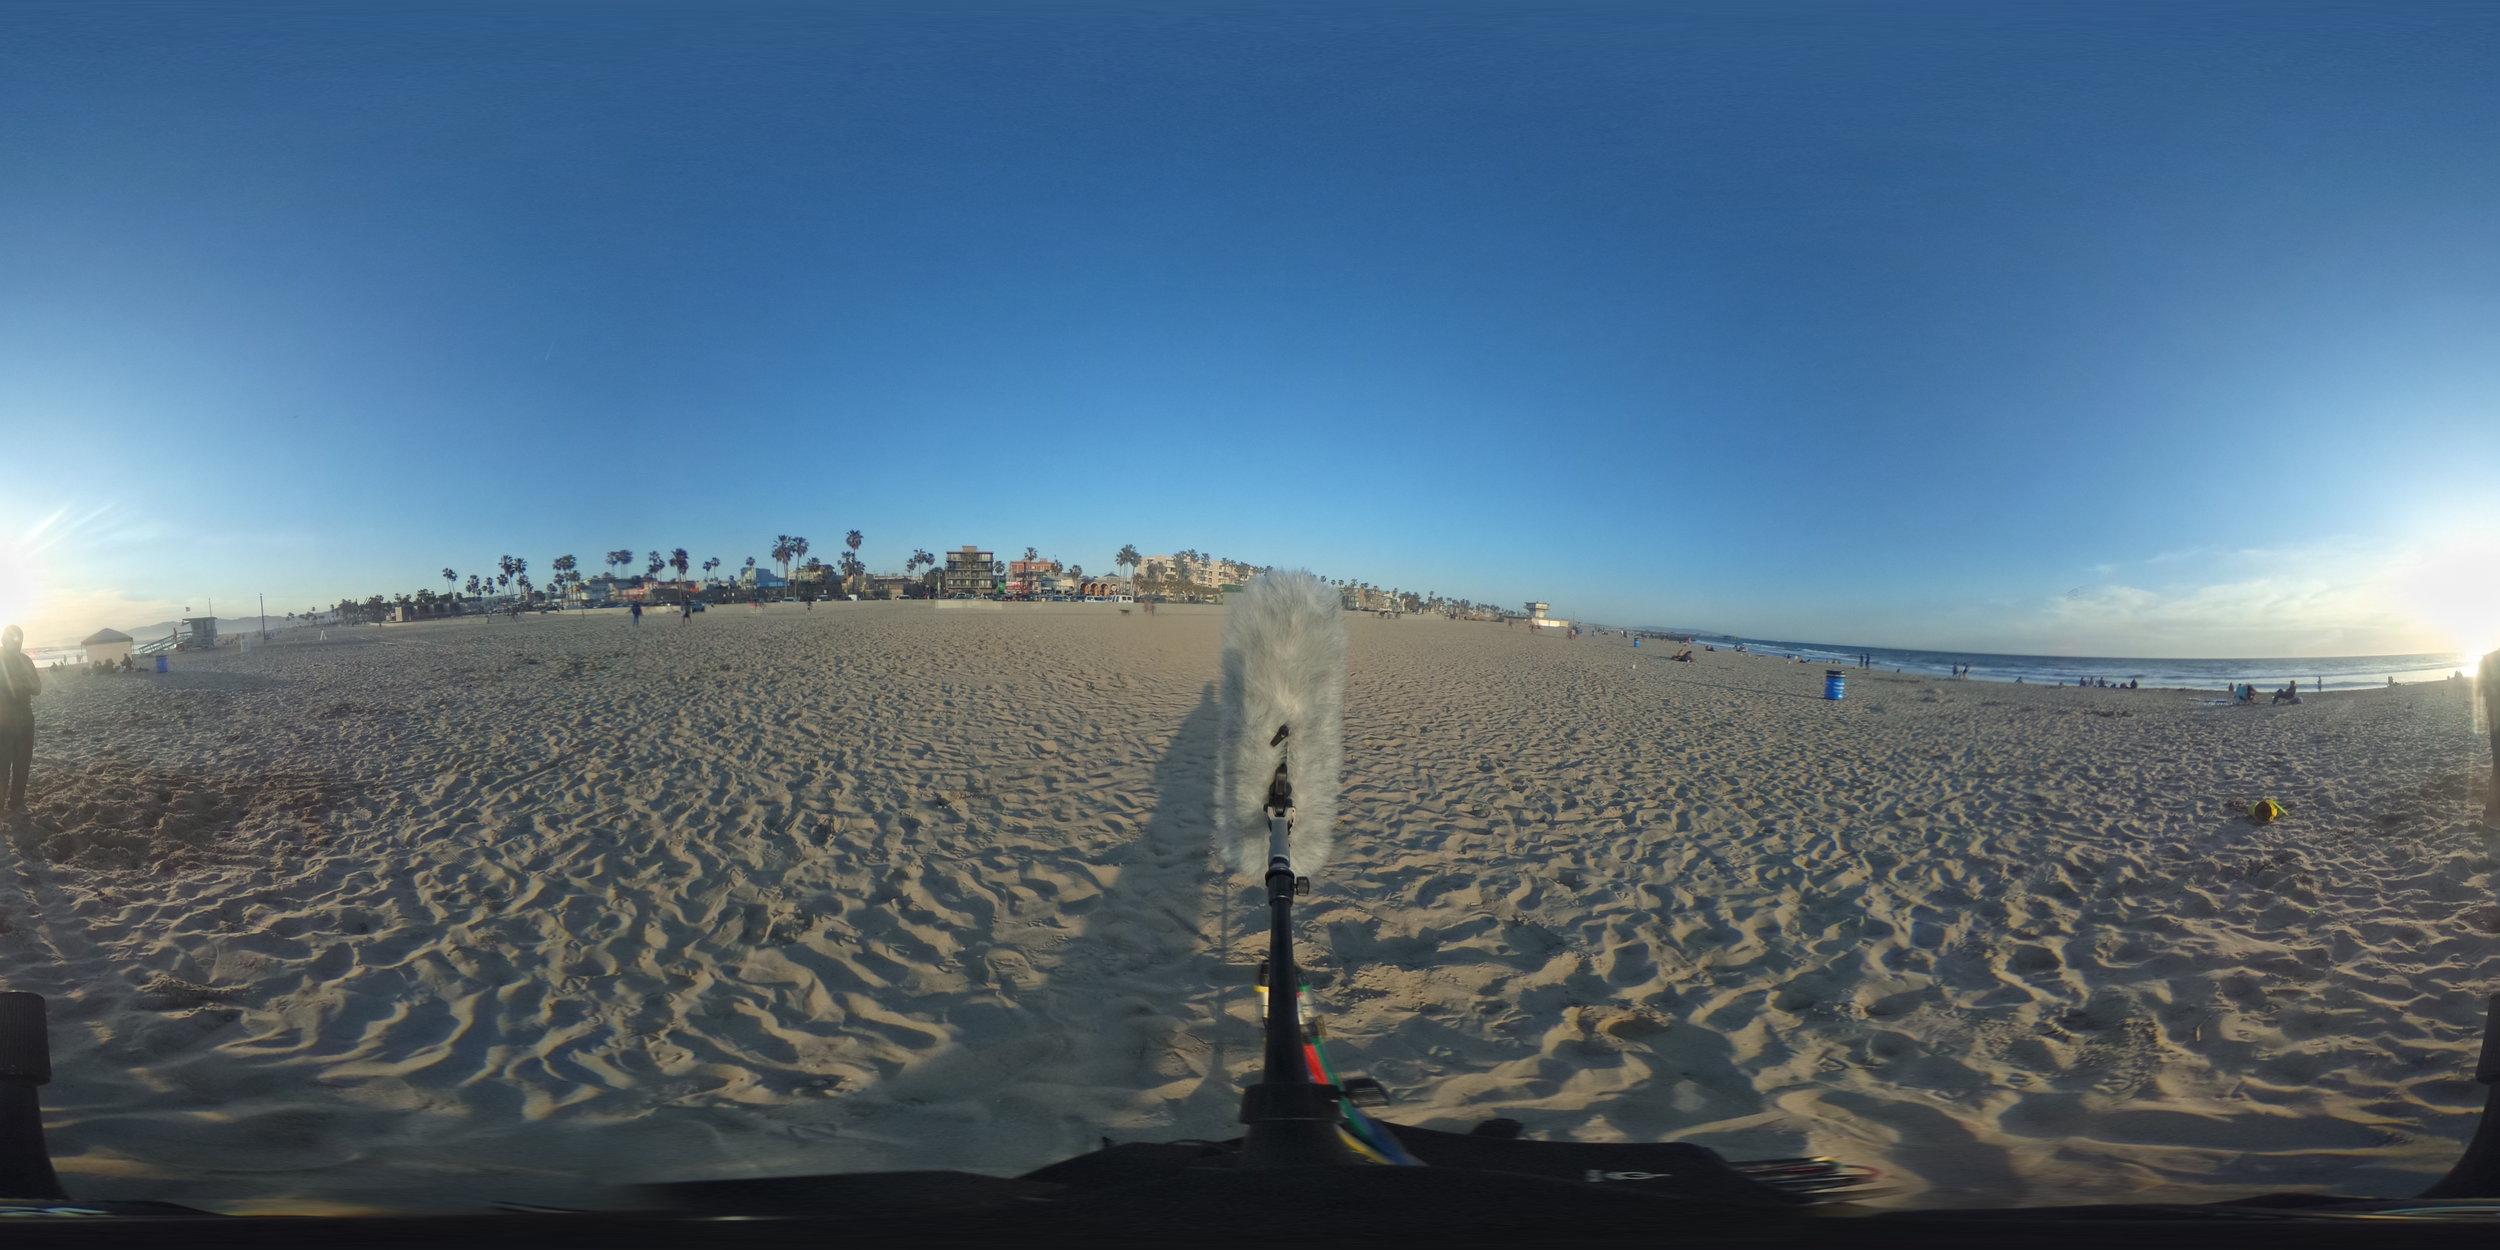 EXT_Day_Beach_MediumWind_MediumWaves_LightWalla_DistantPlaying_LifeguardTruckBy_JPEG.JPG